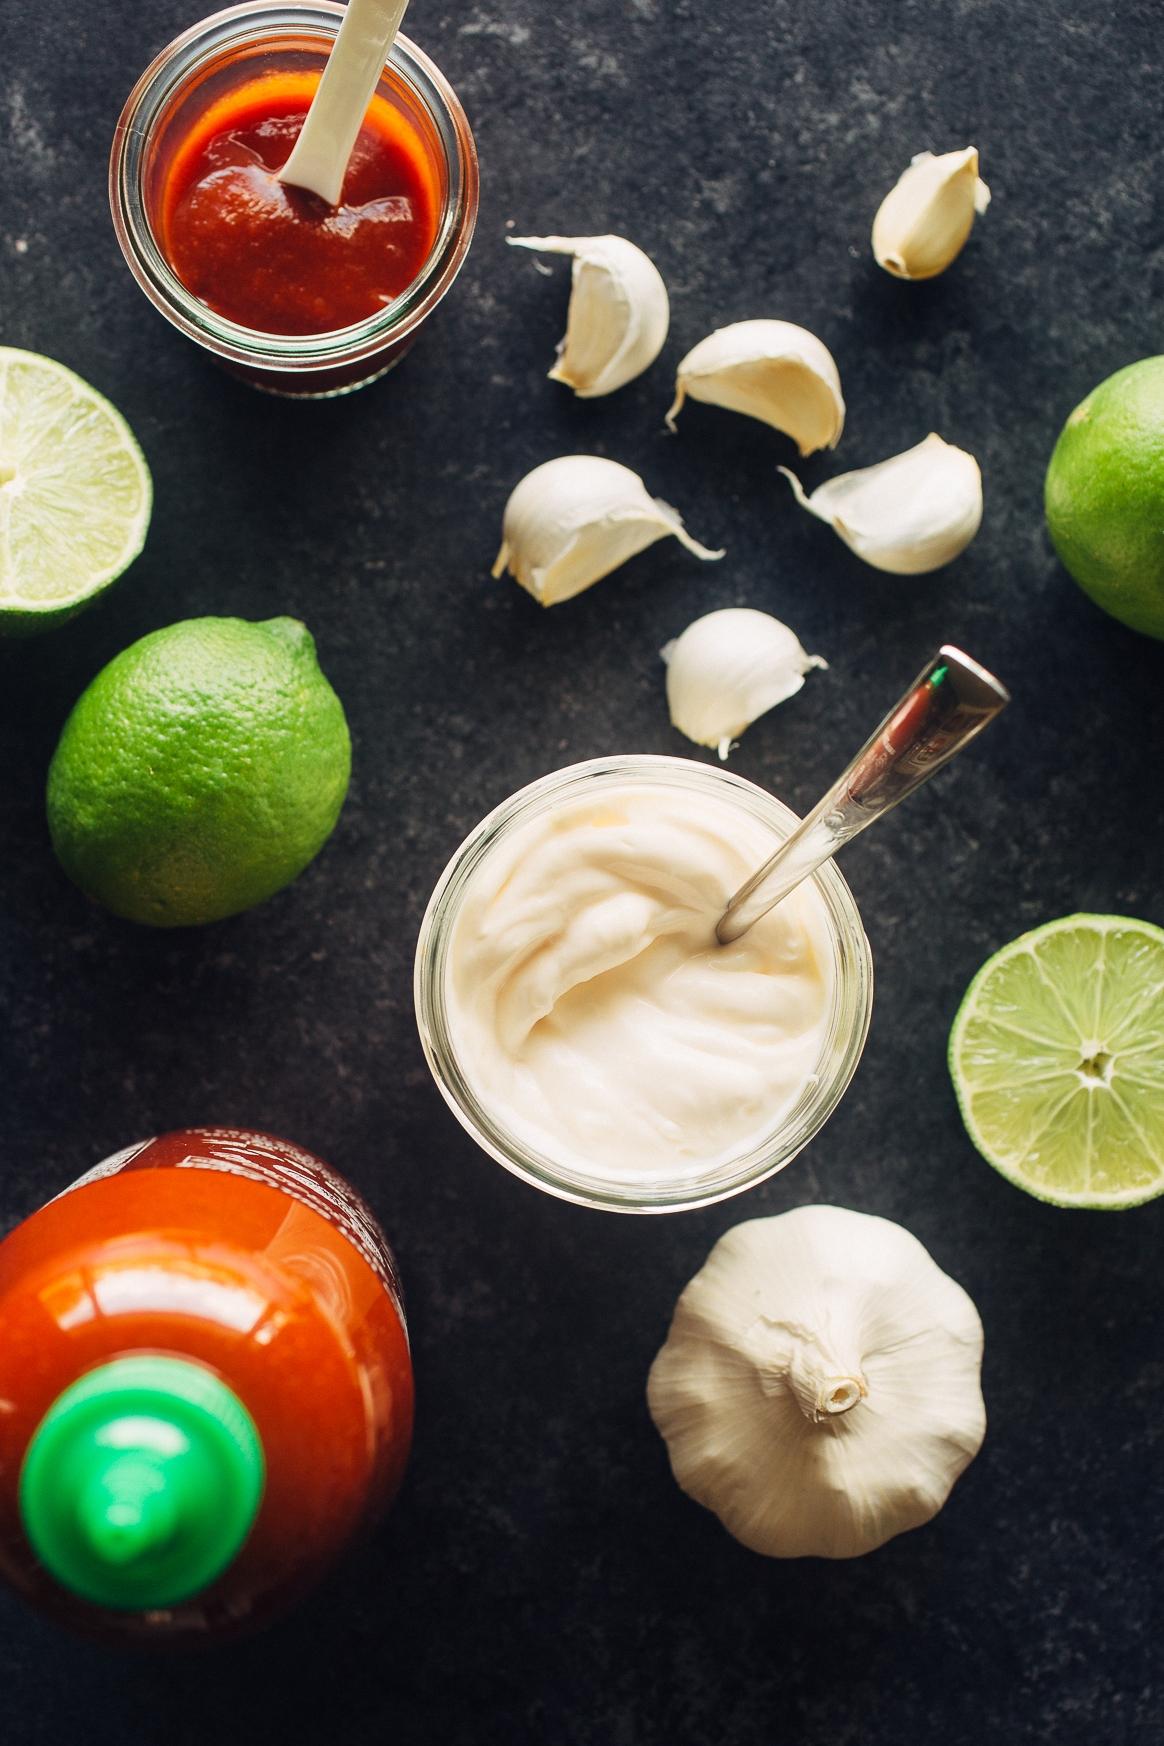 Sriracha Aioli Ingredients